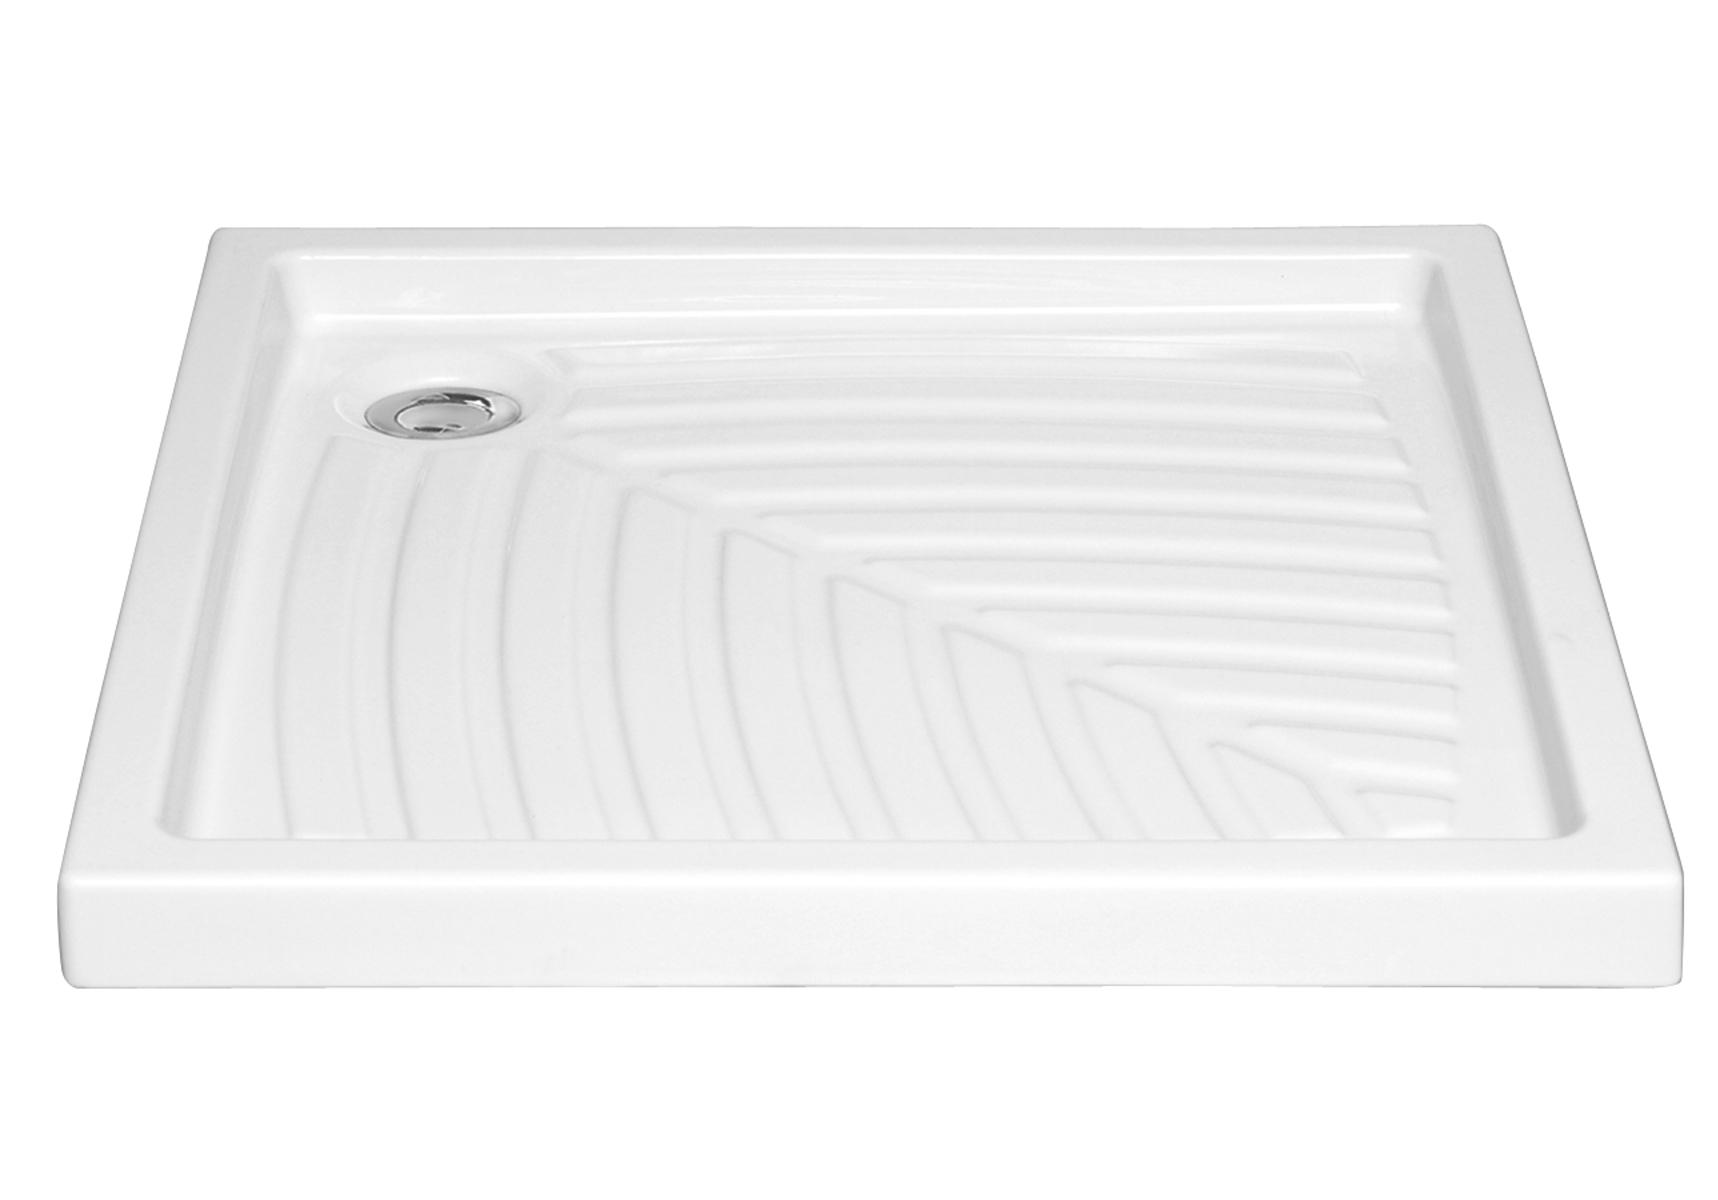 Arkitekt receveur à encastrer ou à poser fond extra plat, VitrA Antislip, 80  x  80 cm, blanc